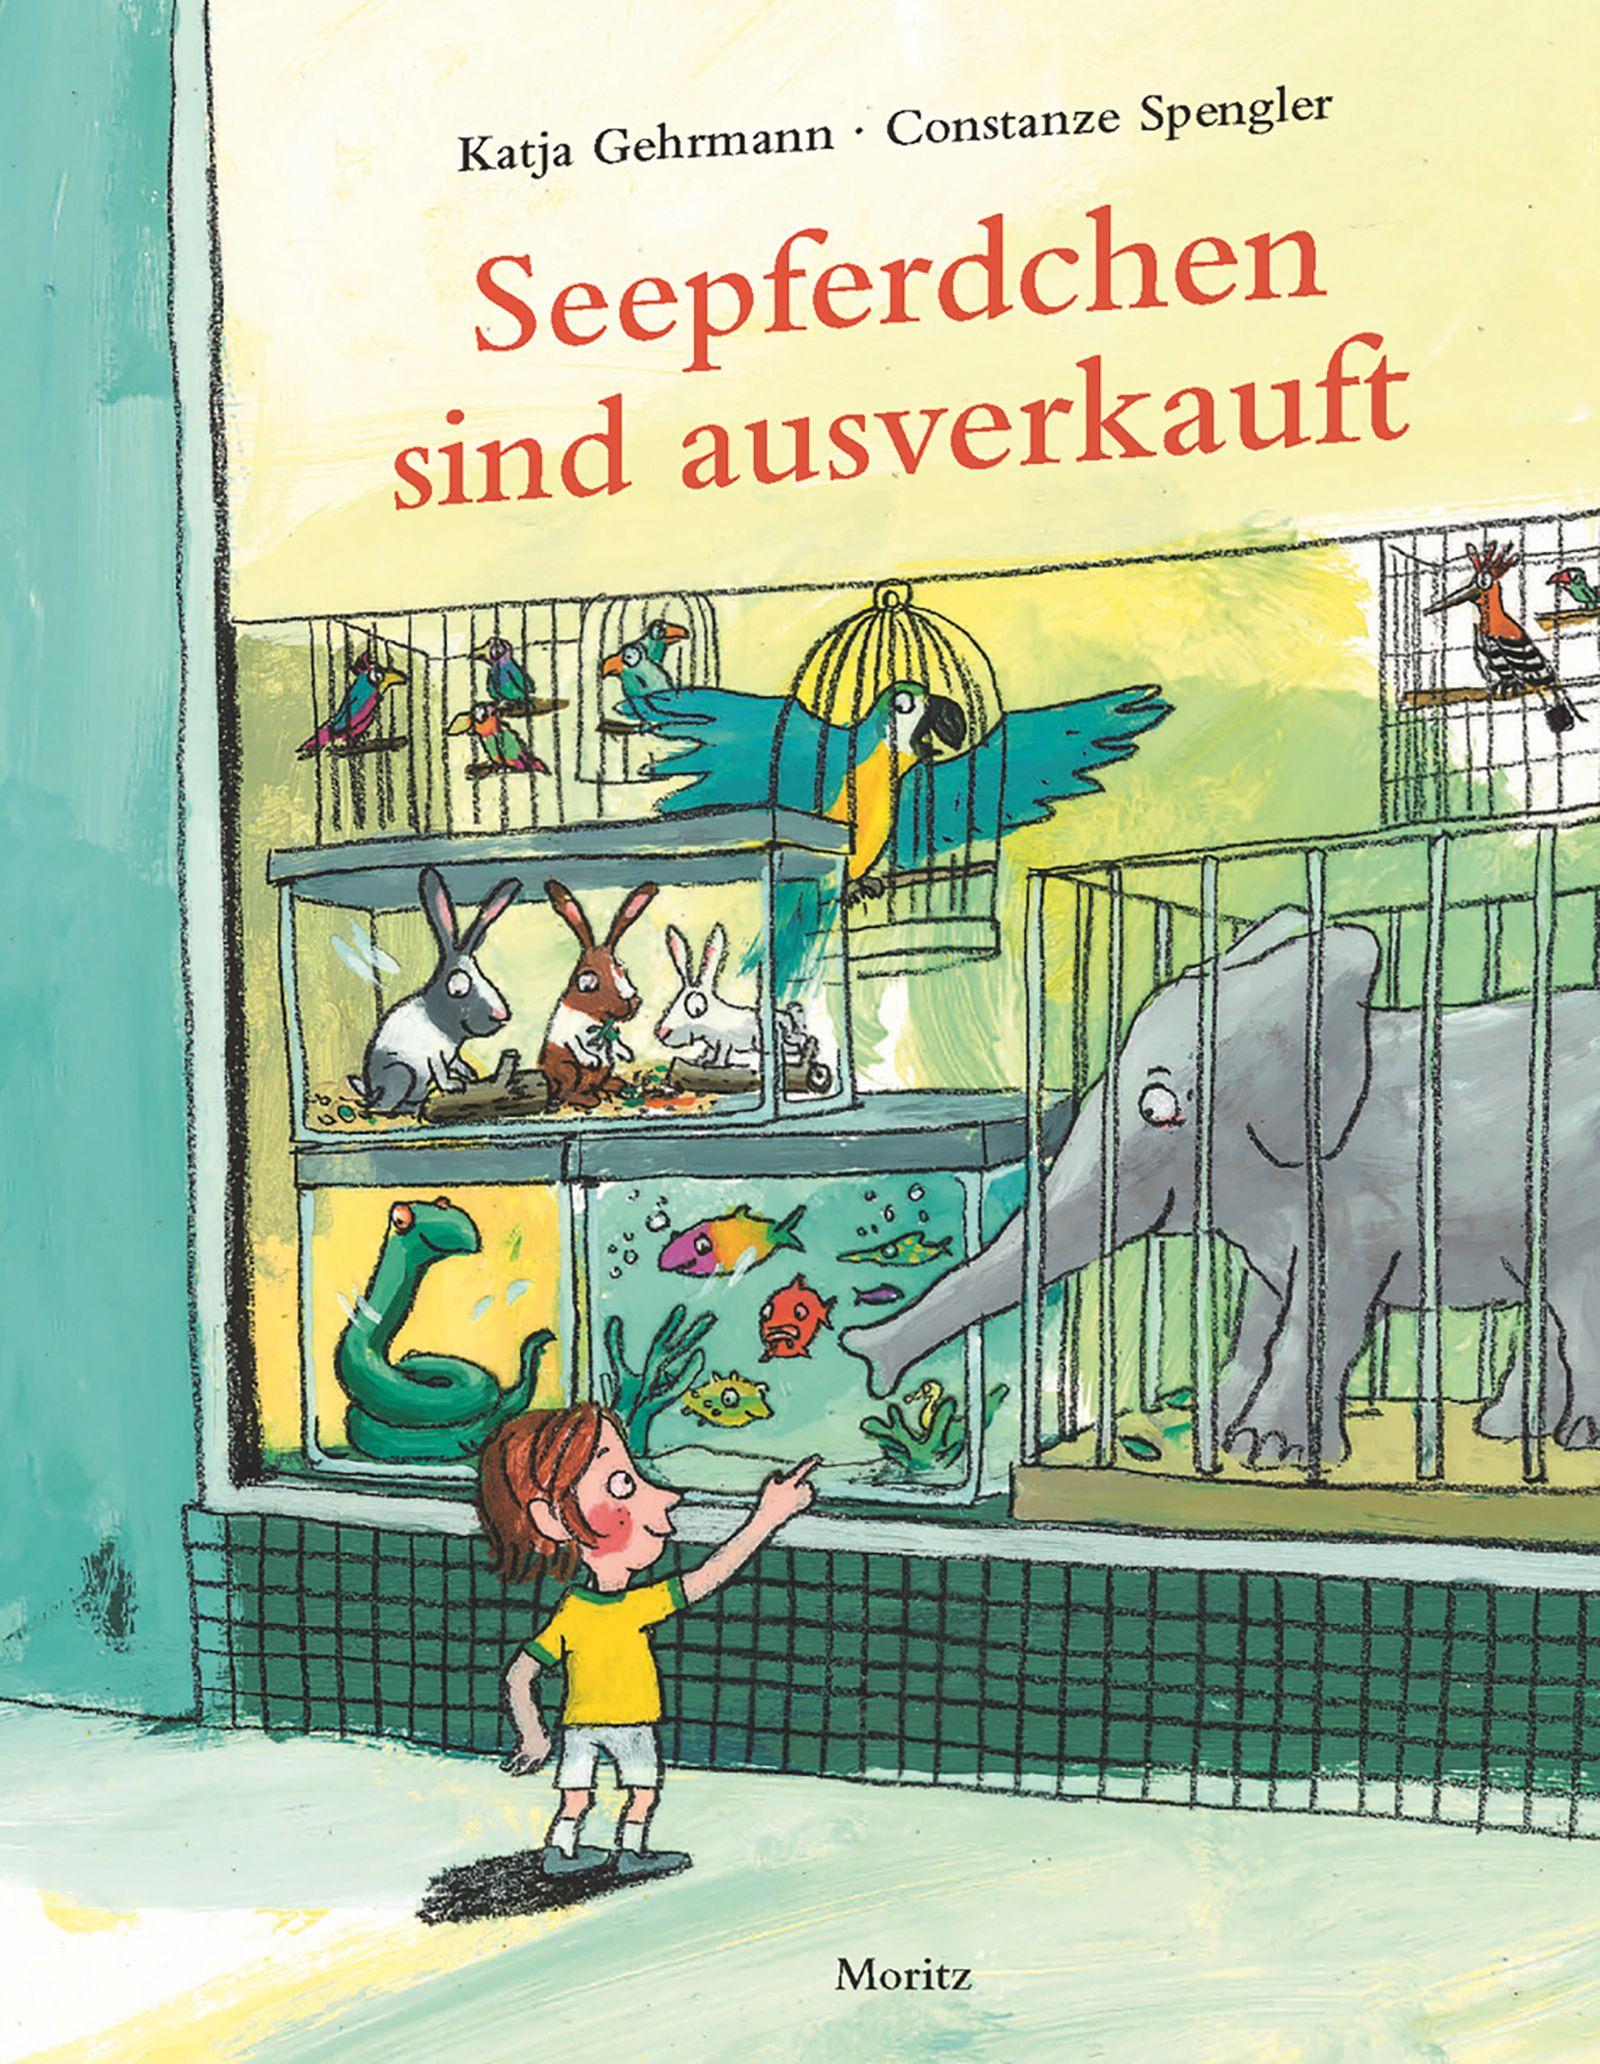 Kinderbücher/ Constanze Spengler& Katja Gehrmann: Seepferdchen sind ausverkauft COVER